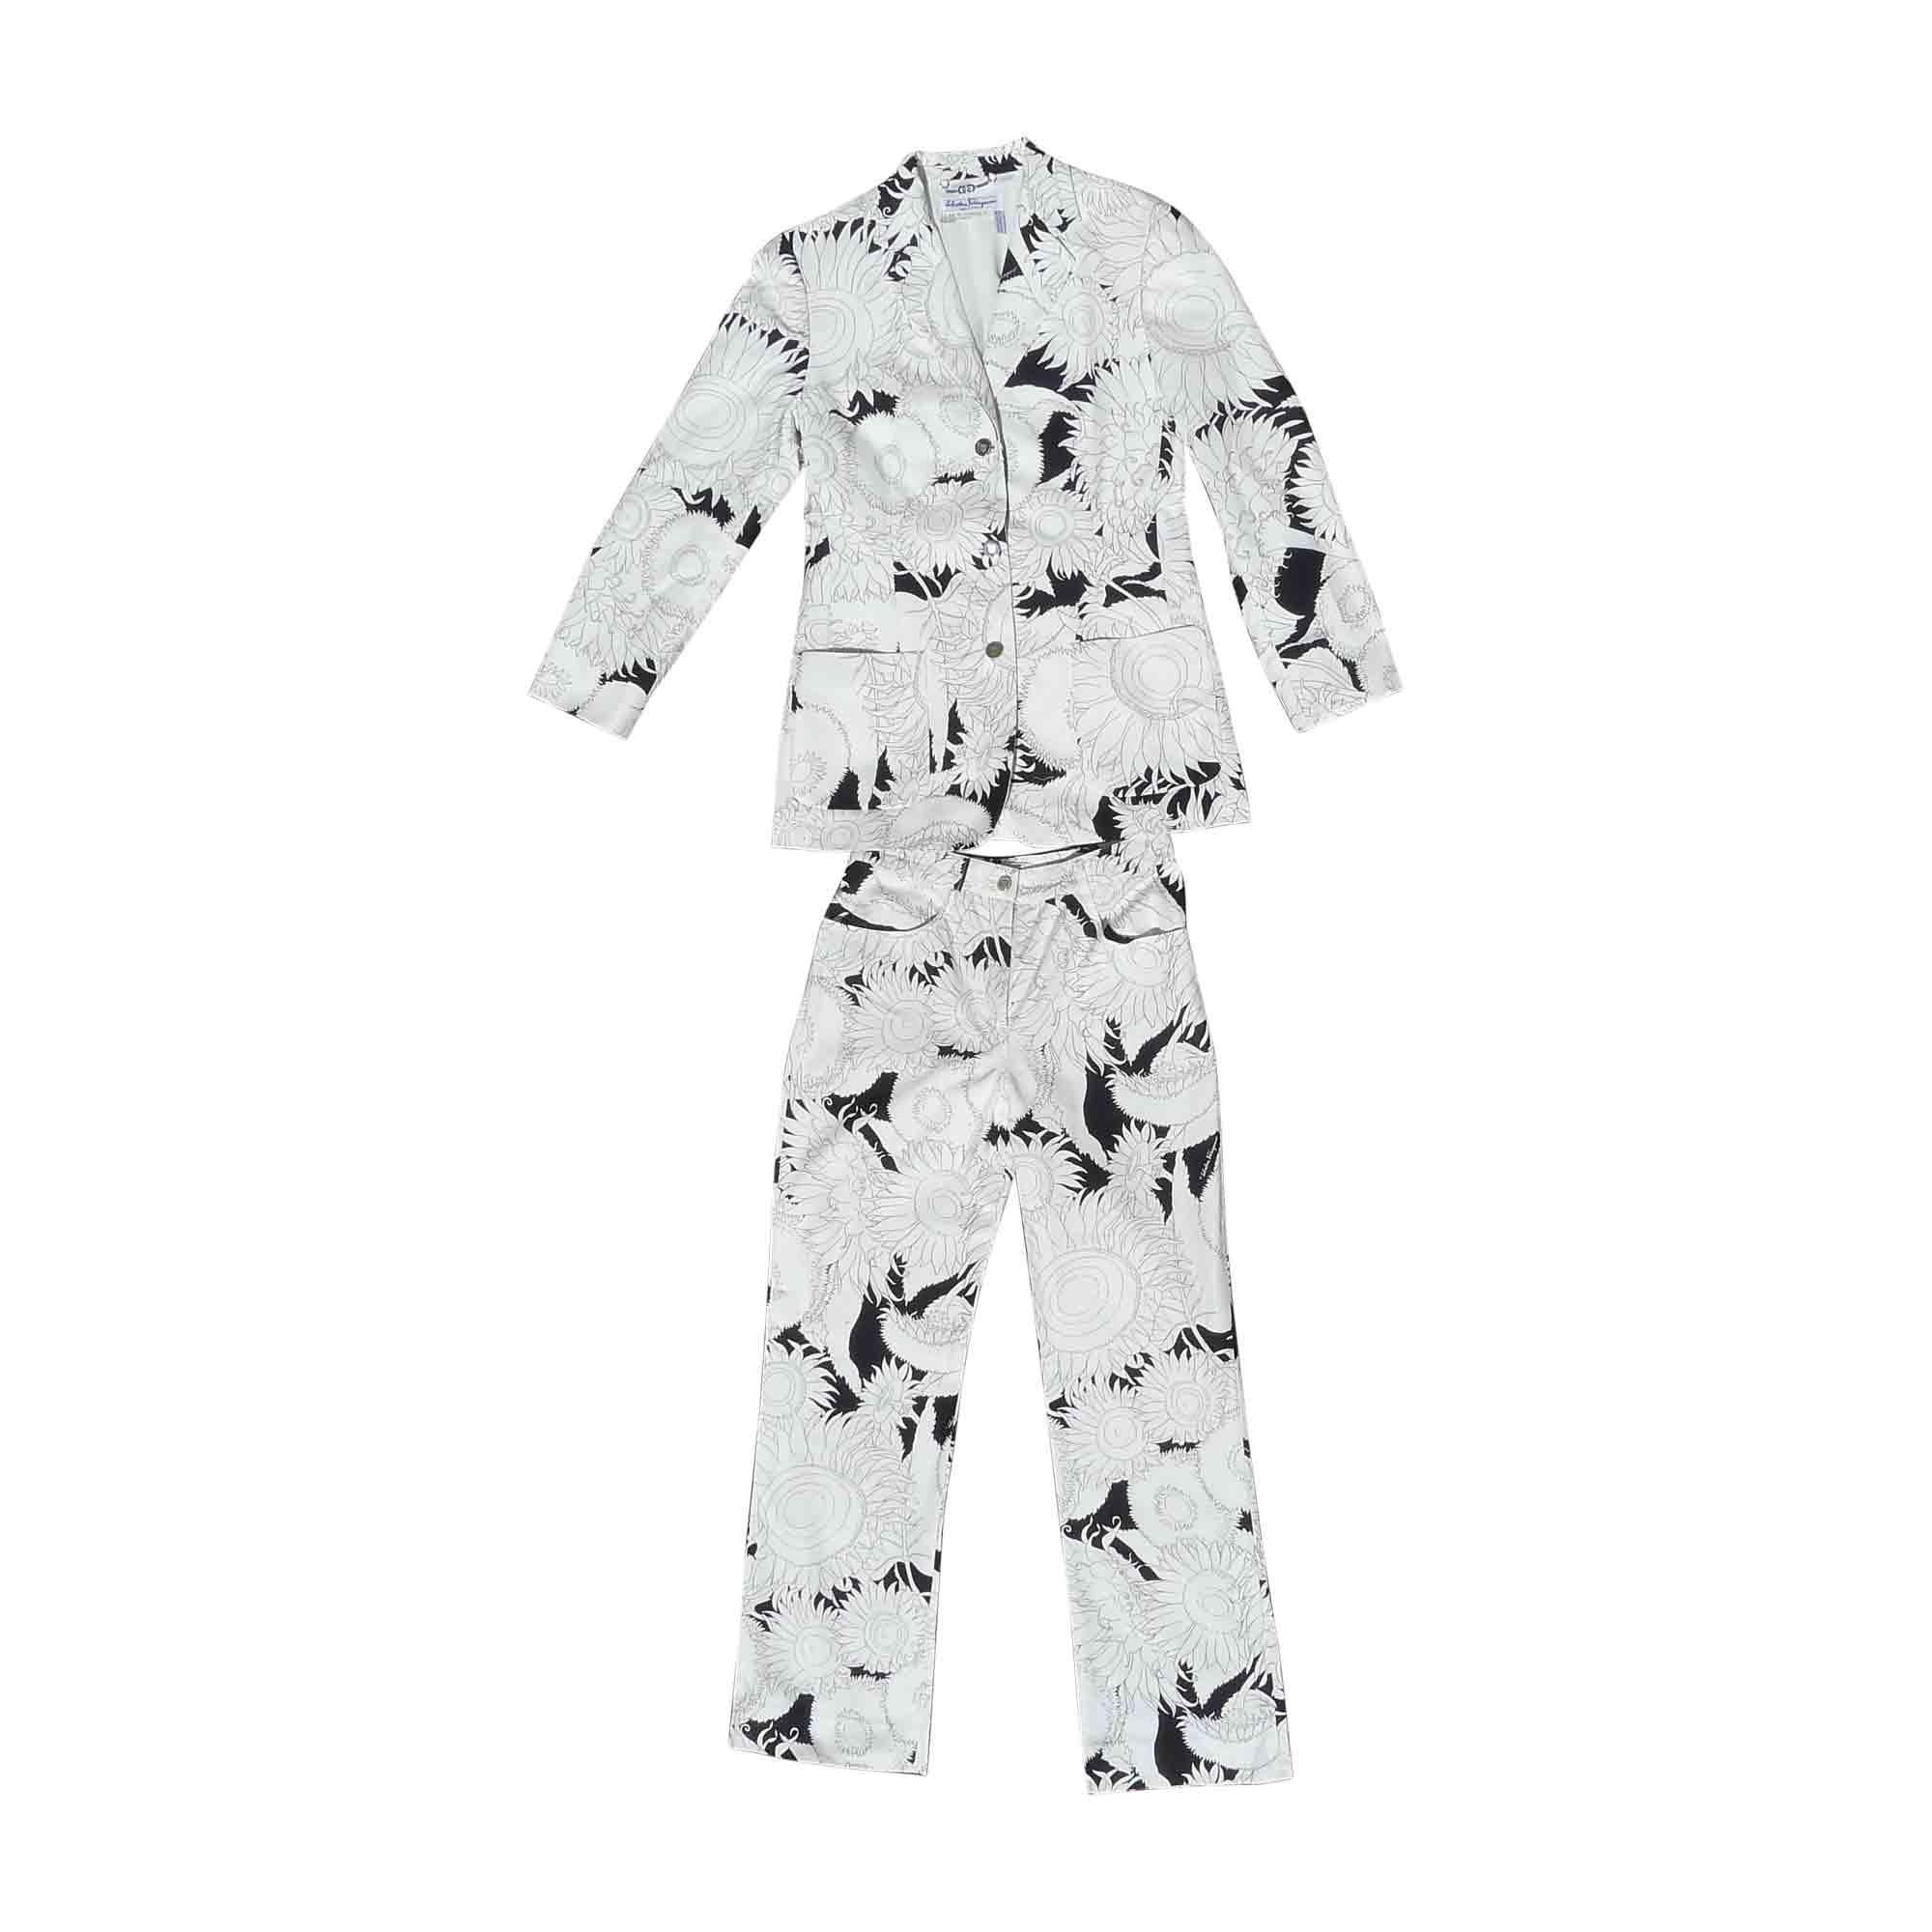 Tailleur pantalon SALVATORE FERRAGAMO Multicouleur